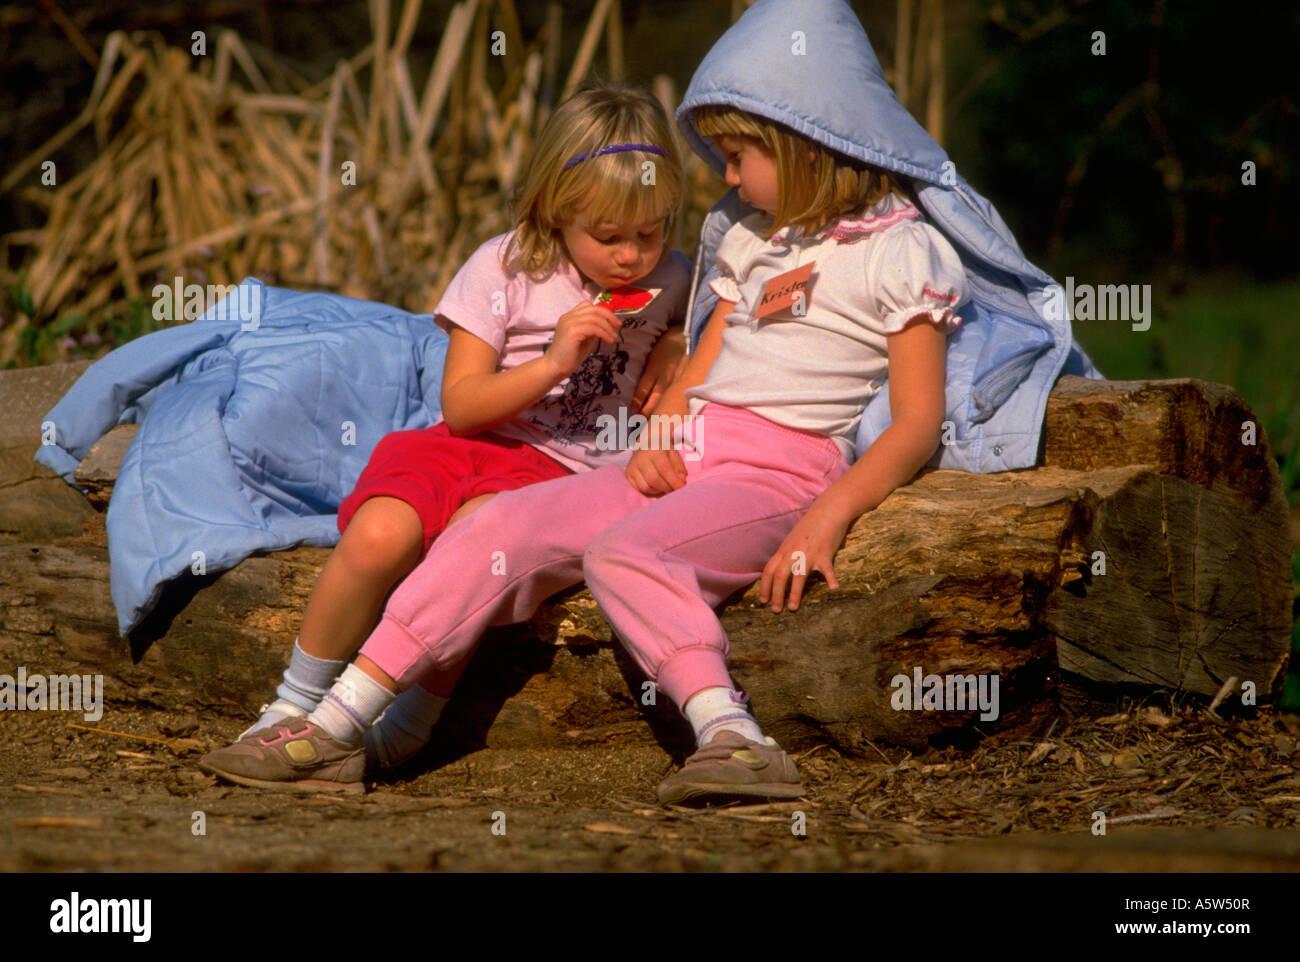 Painet hl0957 two girls children kids girl log sitting fascination exploring woods nature california focused youth - Stock Image